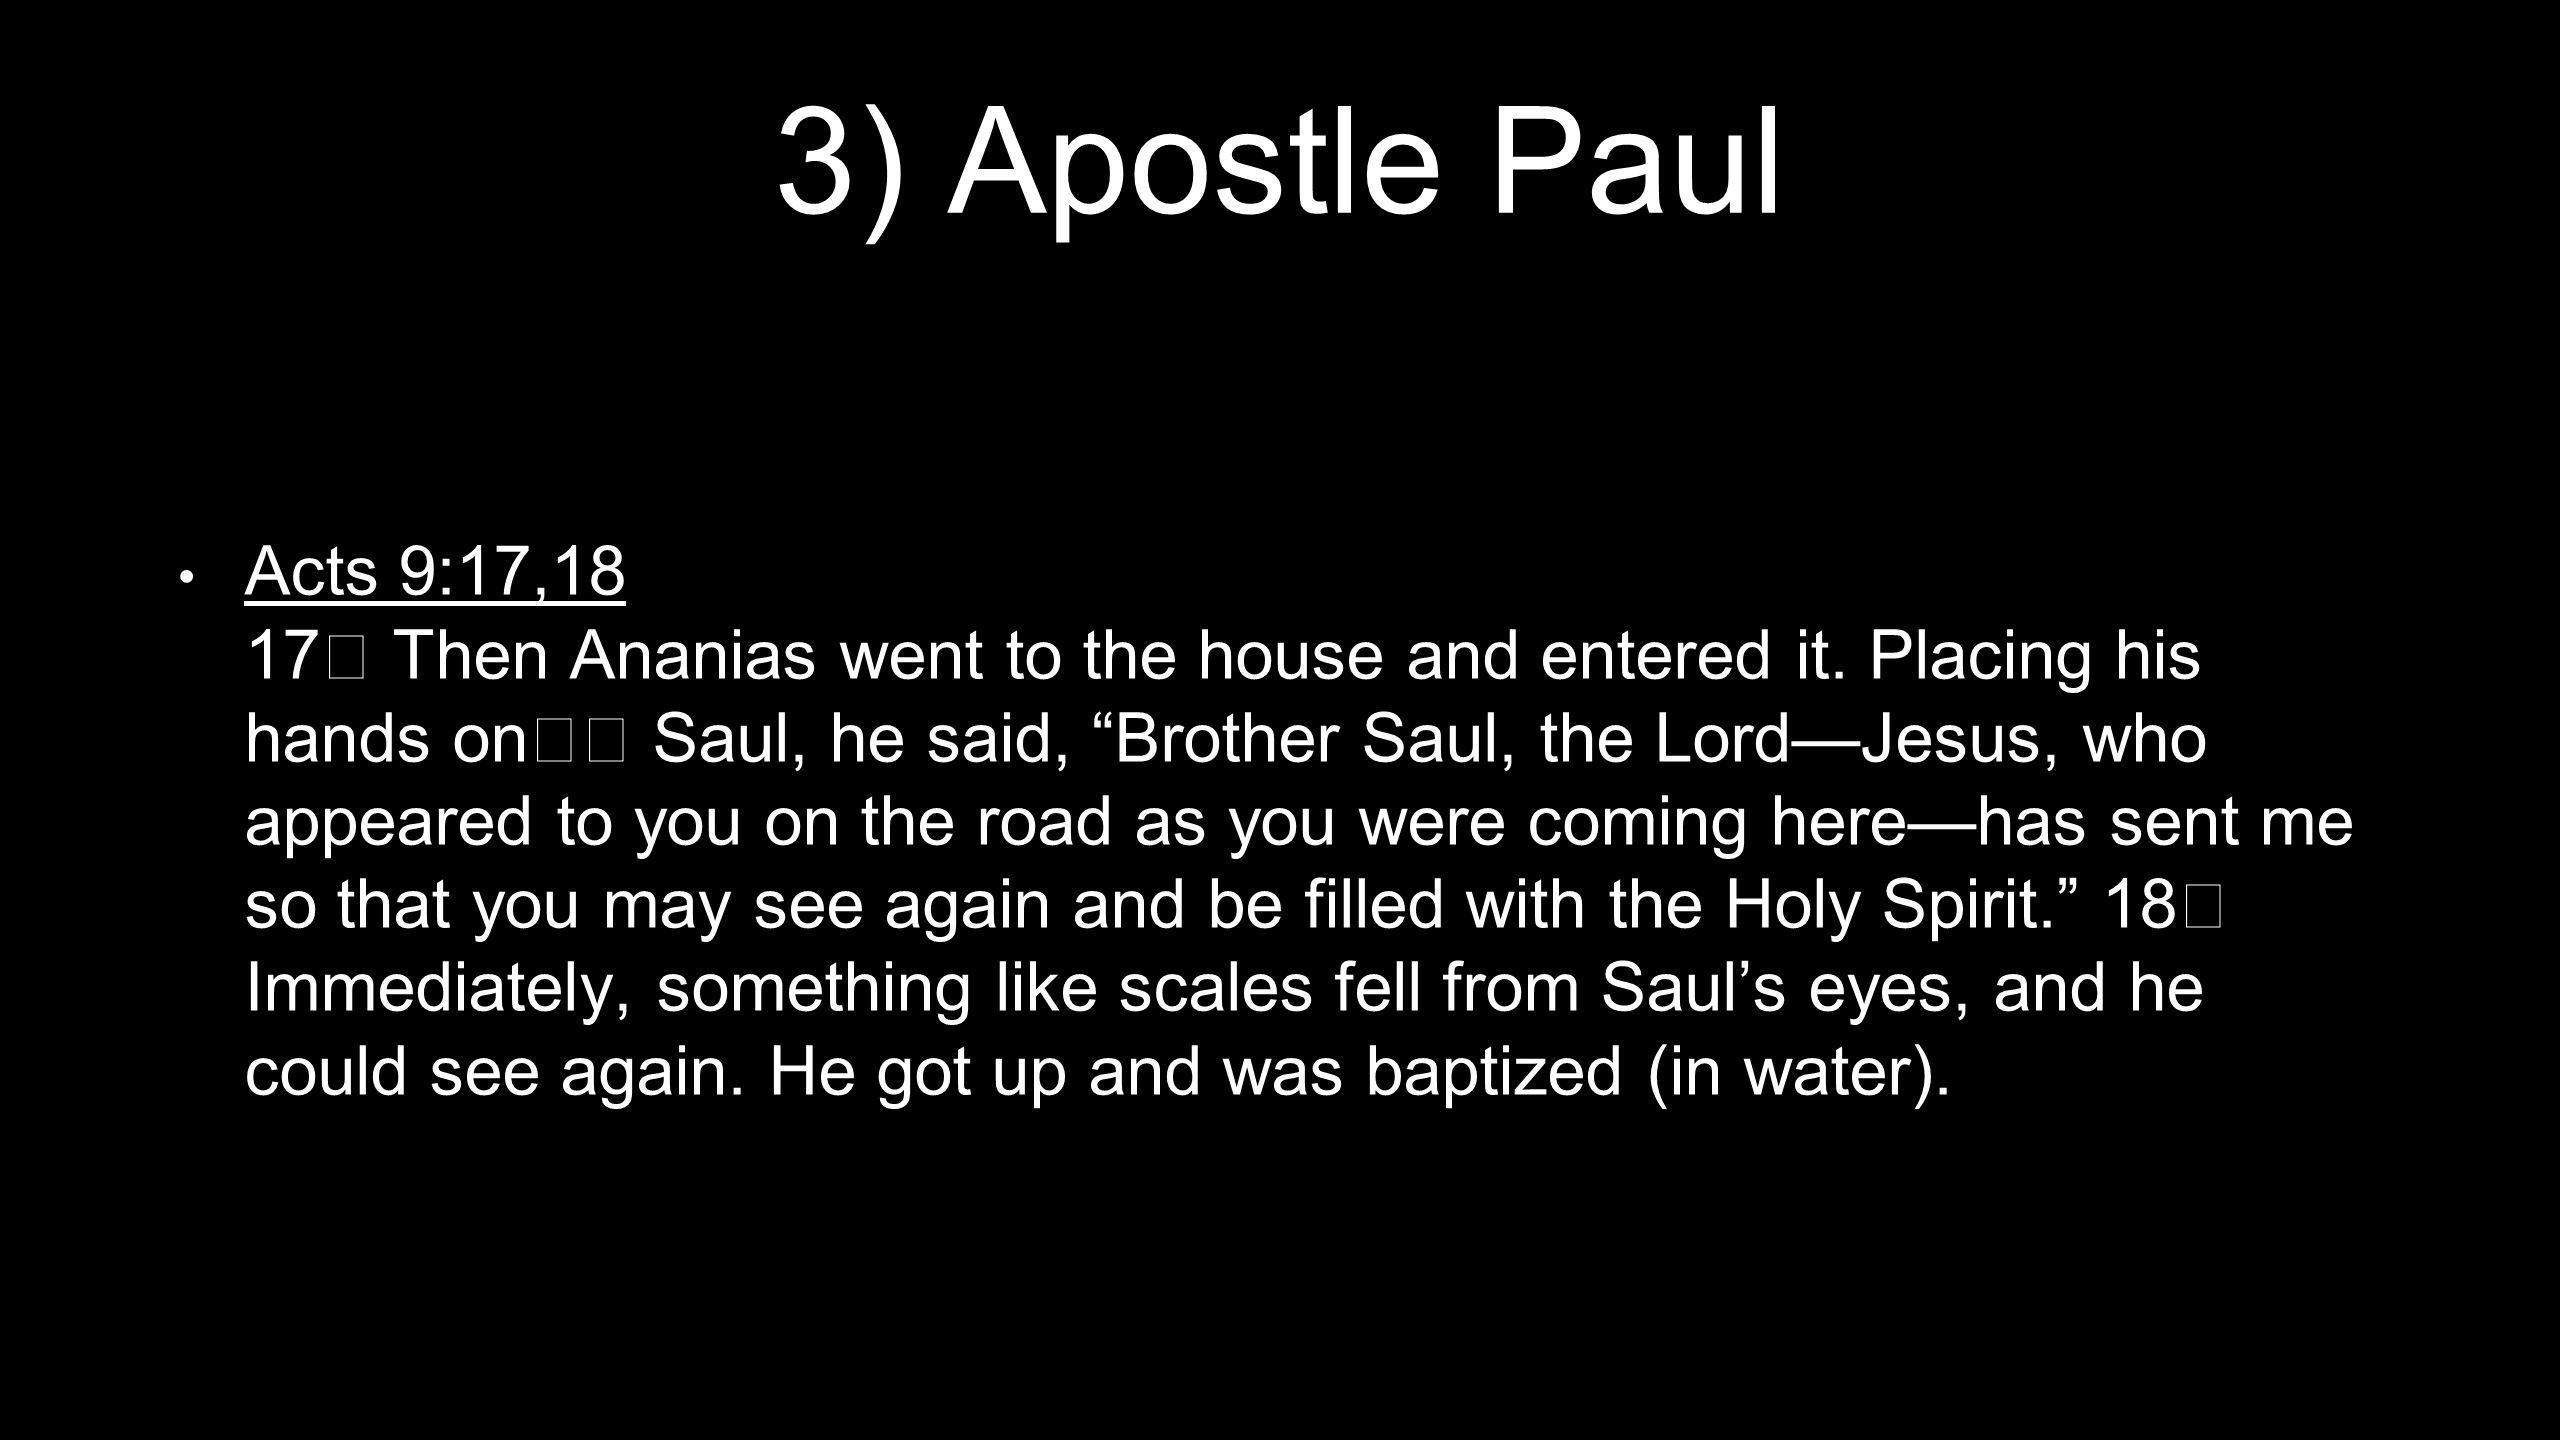 3) Apostle Paul